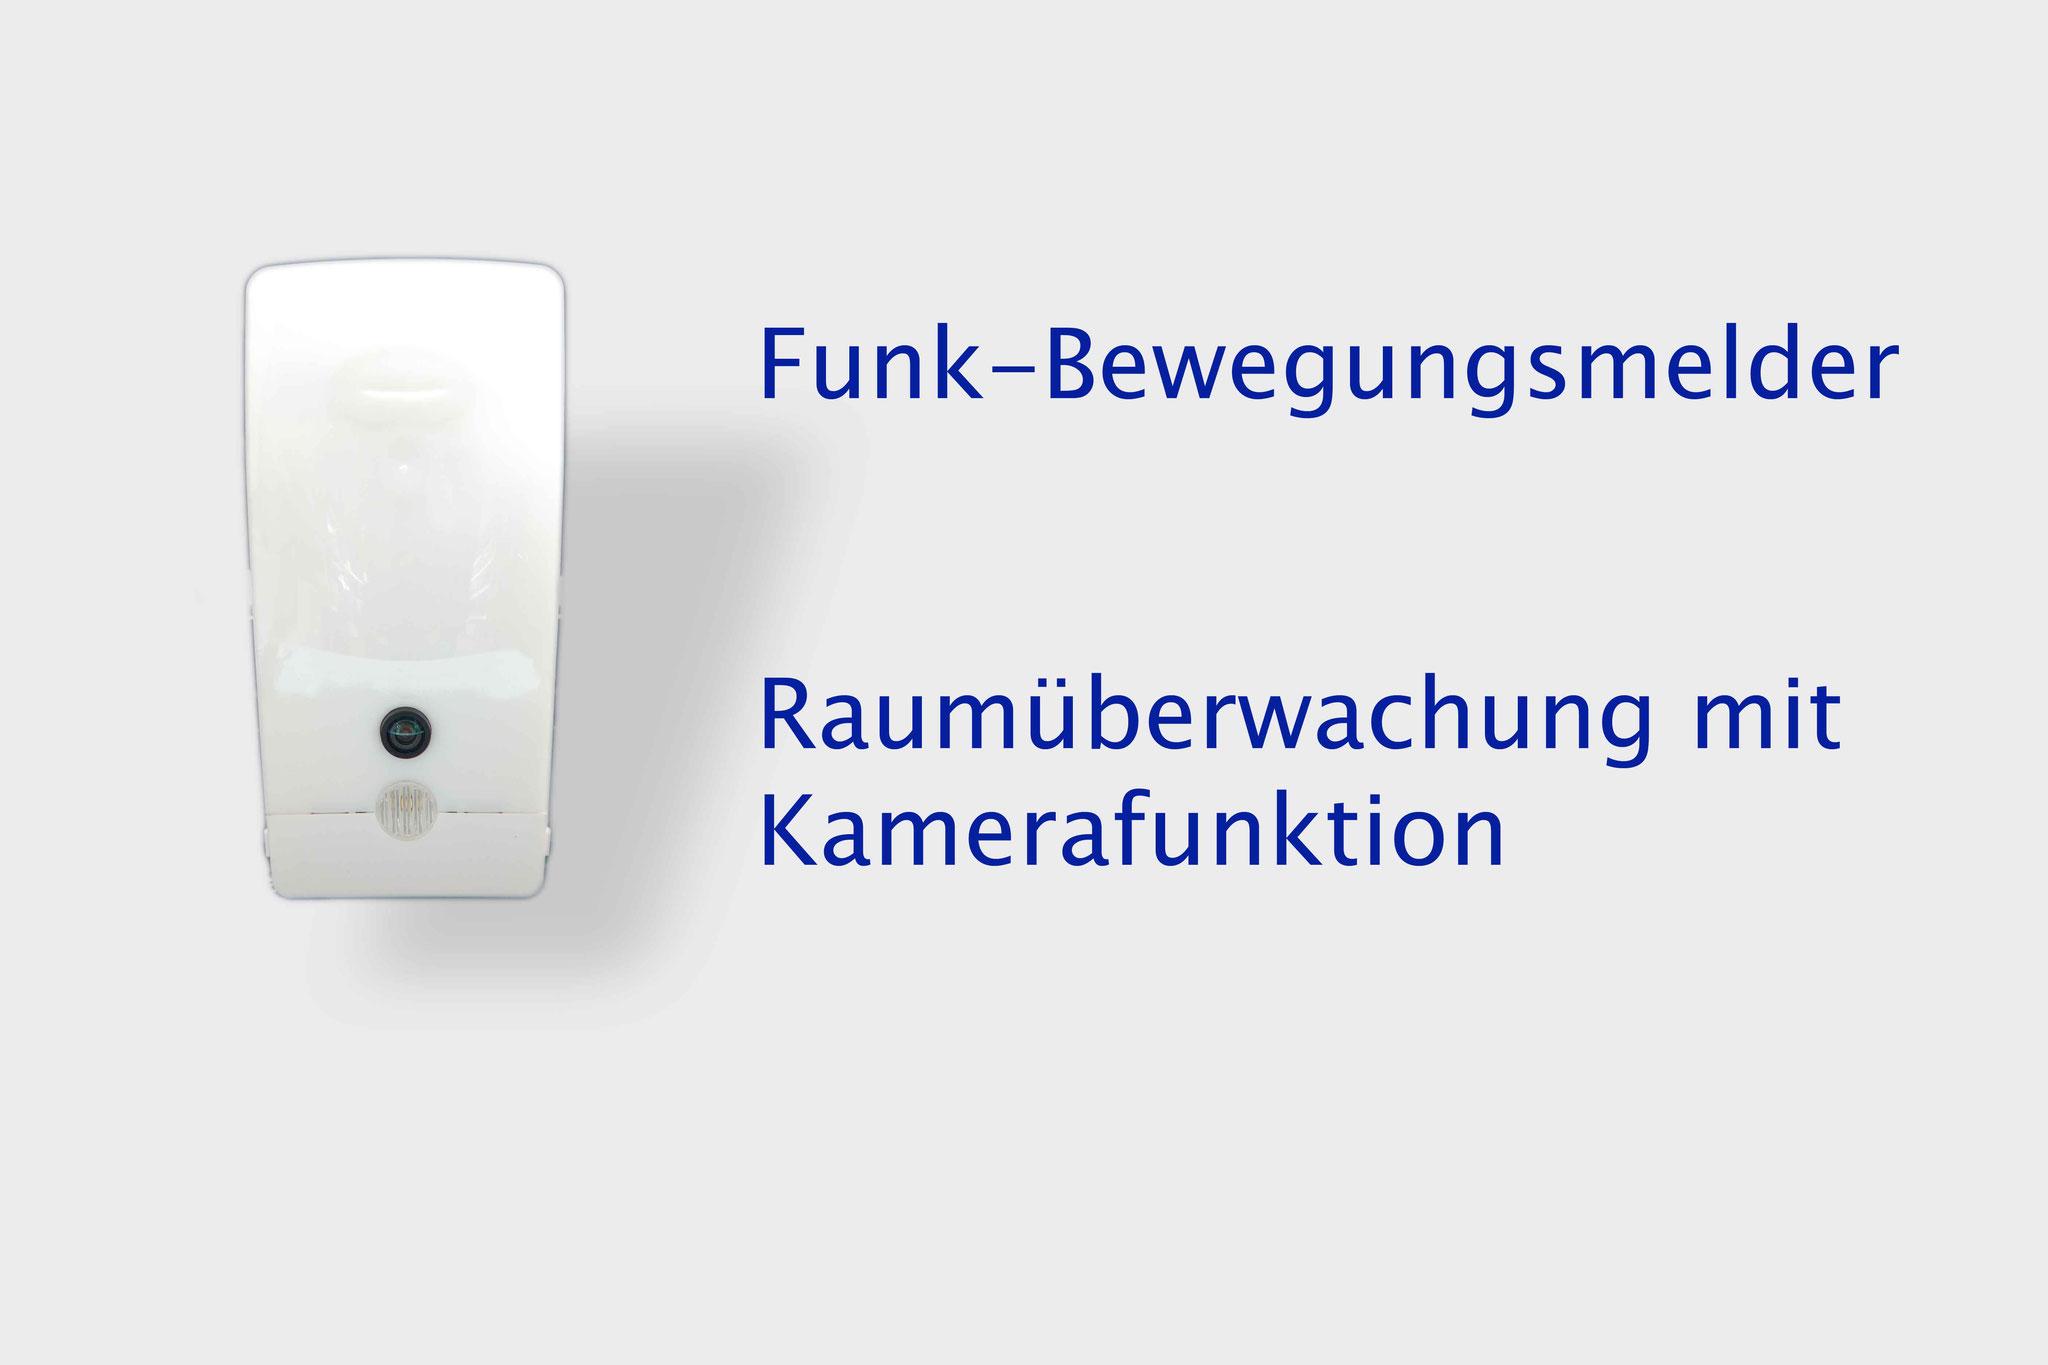 Funk Bewegungsmelder plus Kamerafunktion